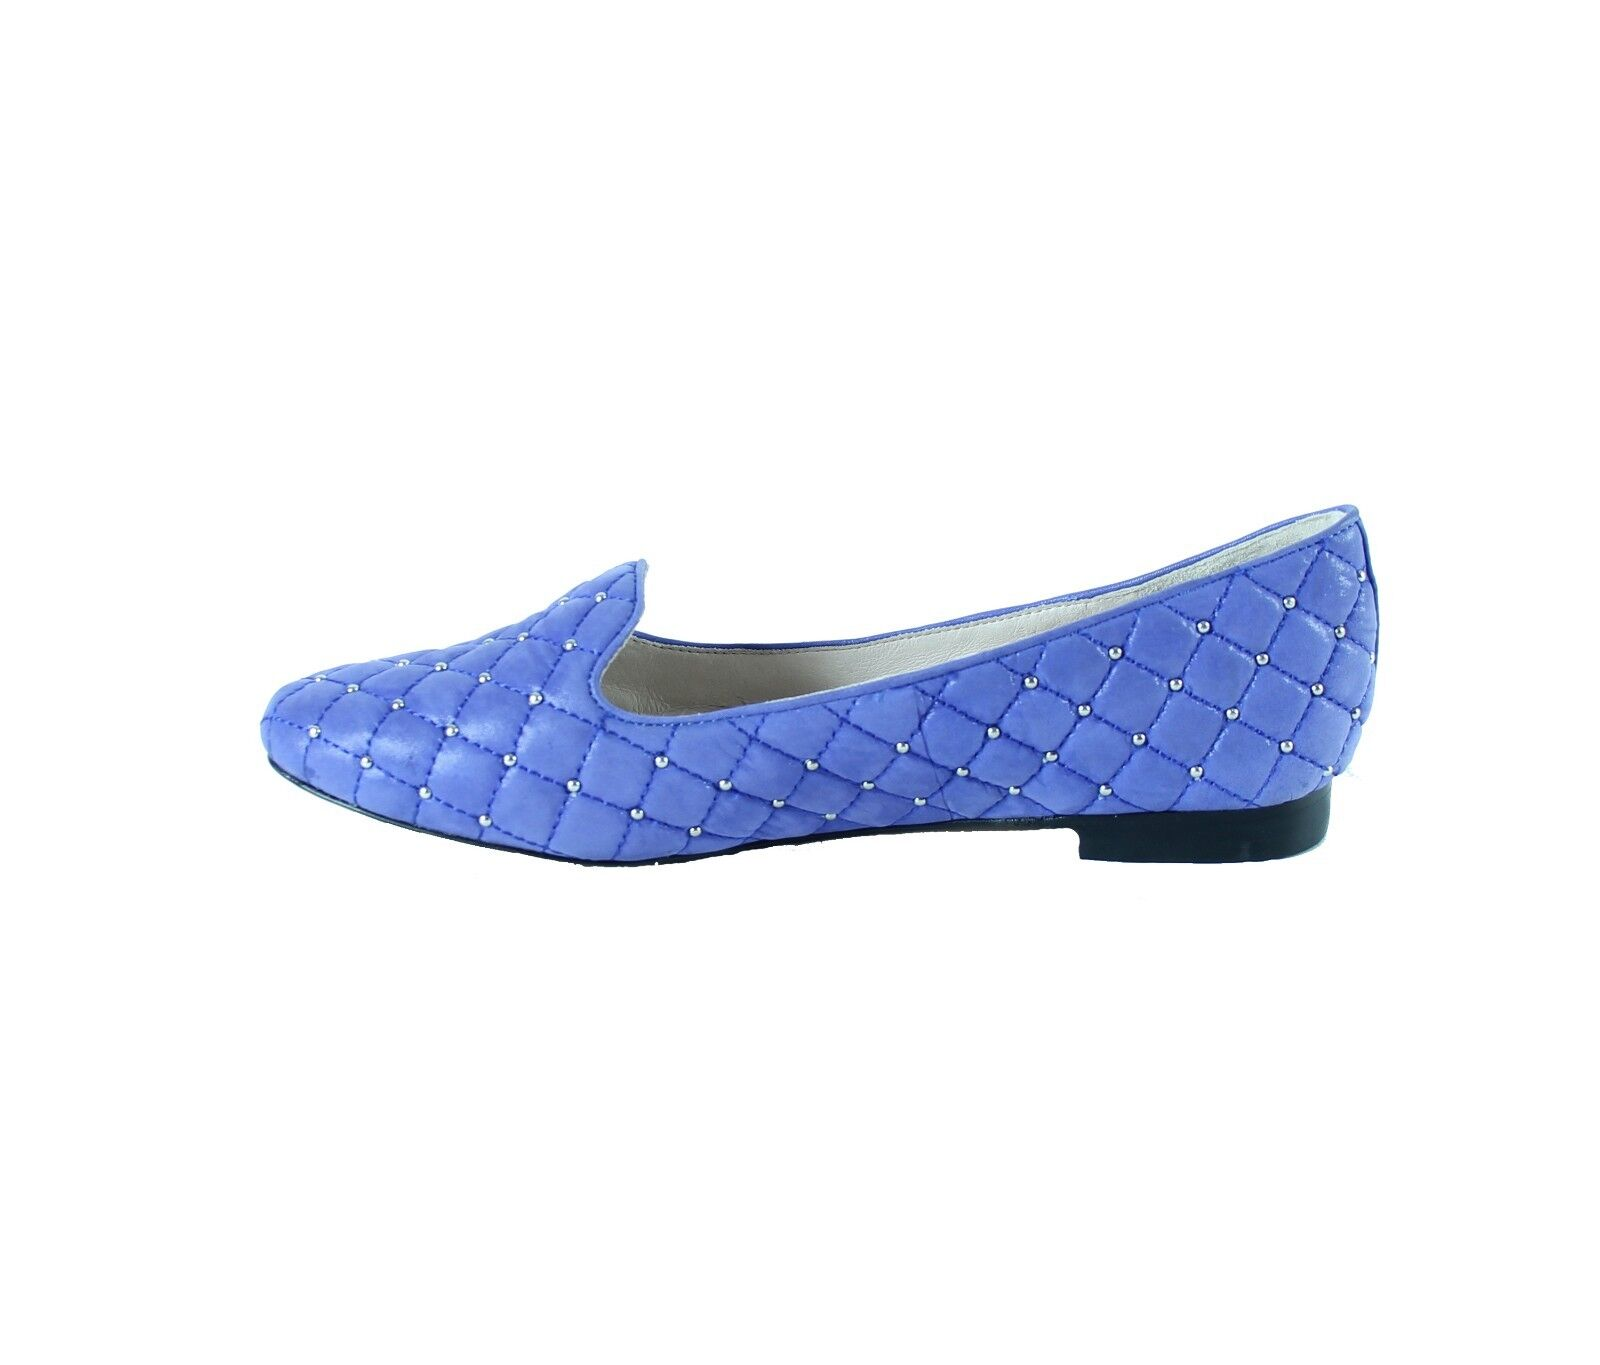 VINCE CAMUTO WOMEN'S Blau LILLIANA 2 LOAFERS, DAZZLE Blau WOMEN'S ba4caa